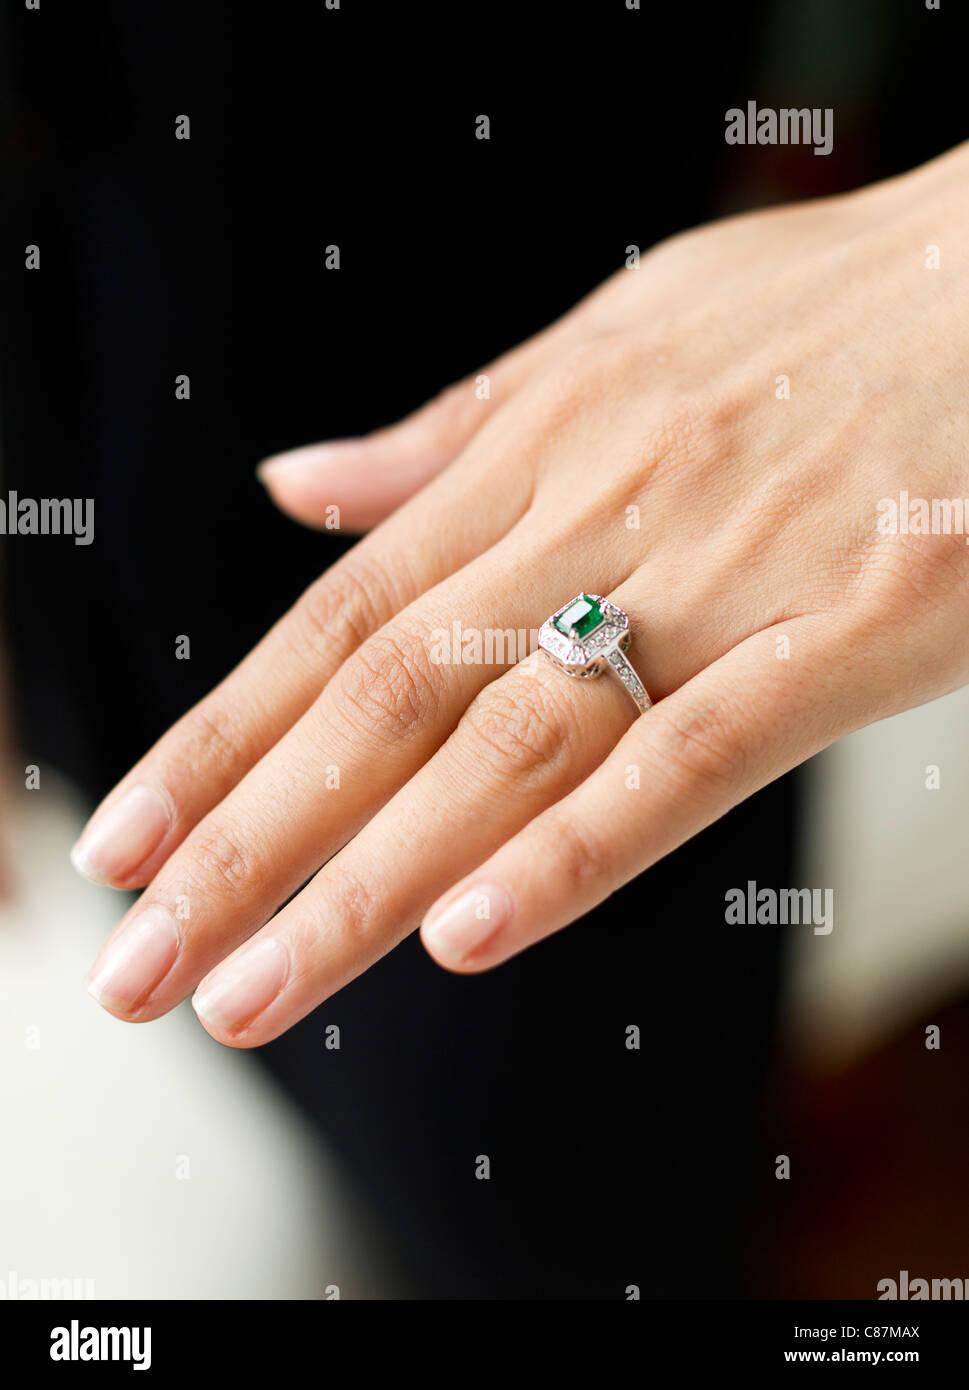 Woman wearing engagement ring - Stock Image